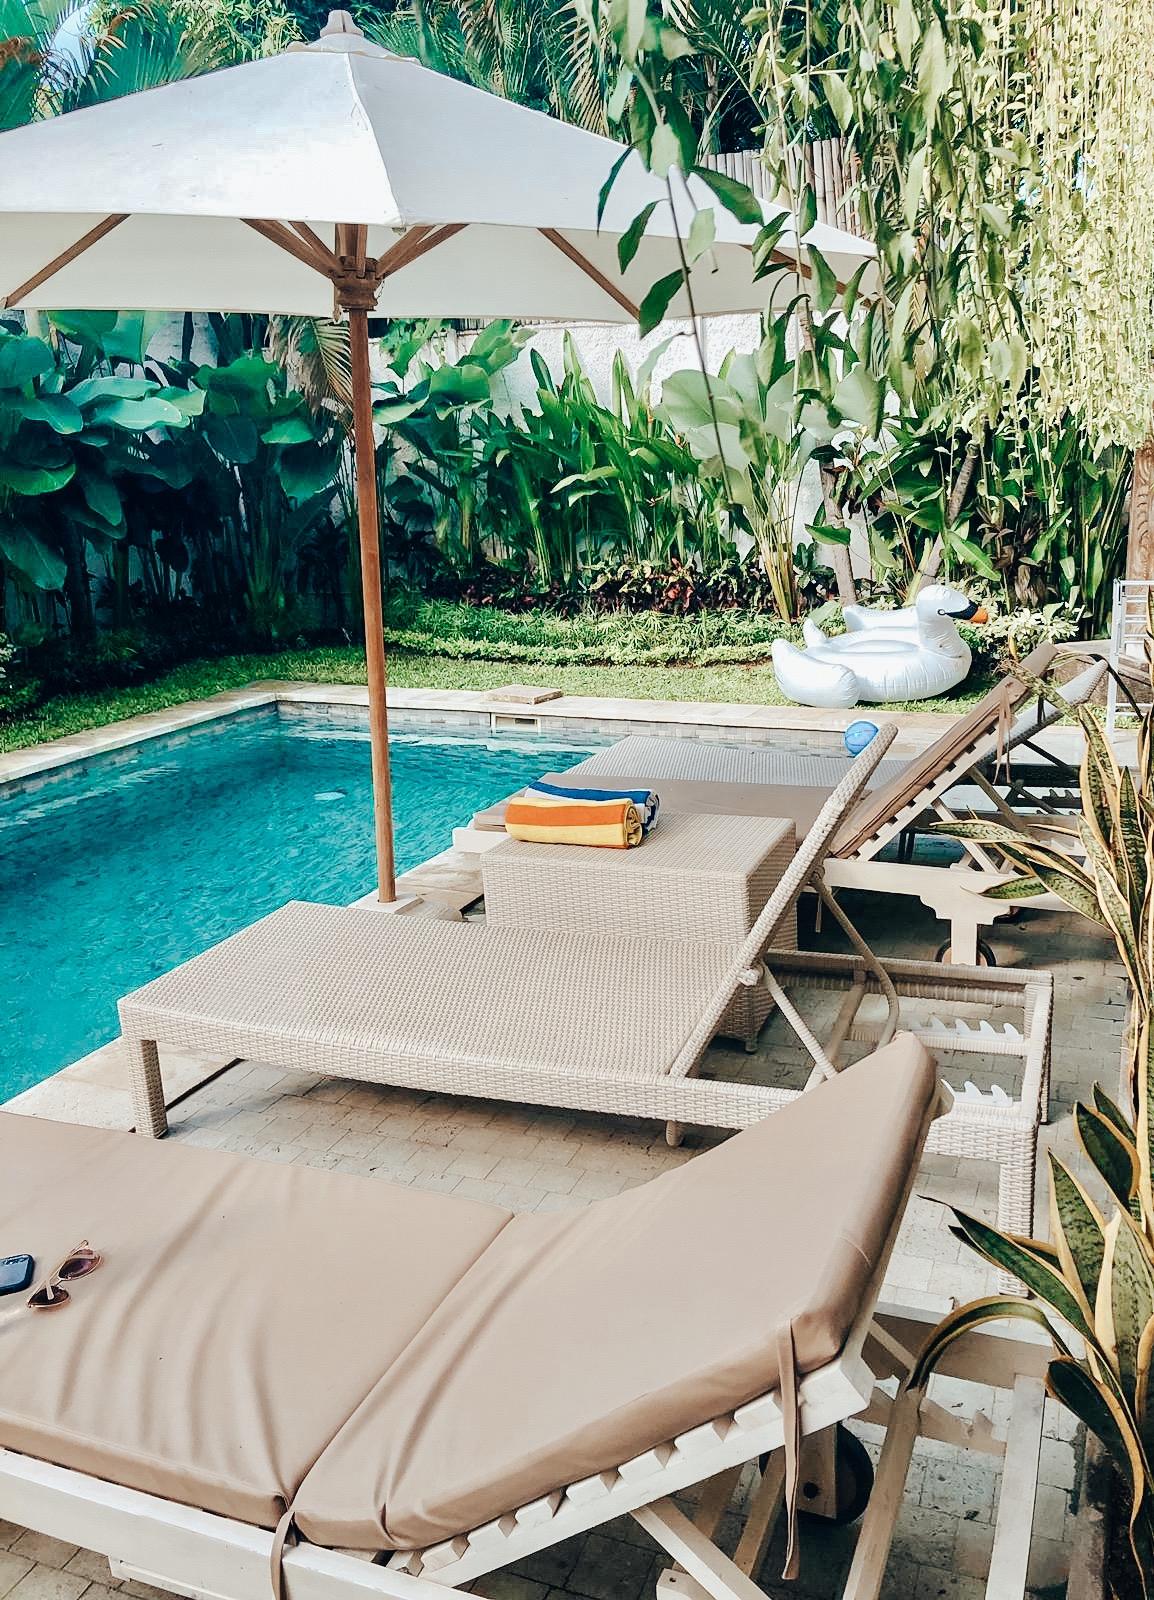 Our villa (airbnb) in Seminyak, Bali!